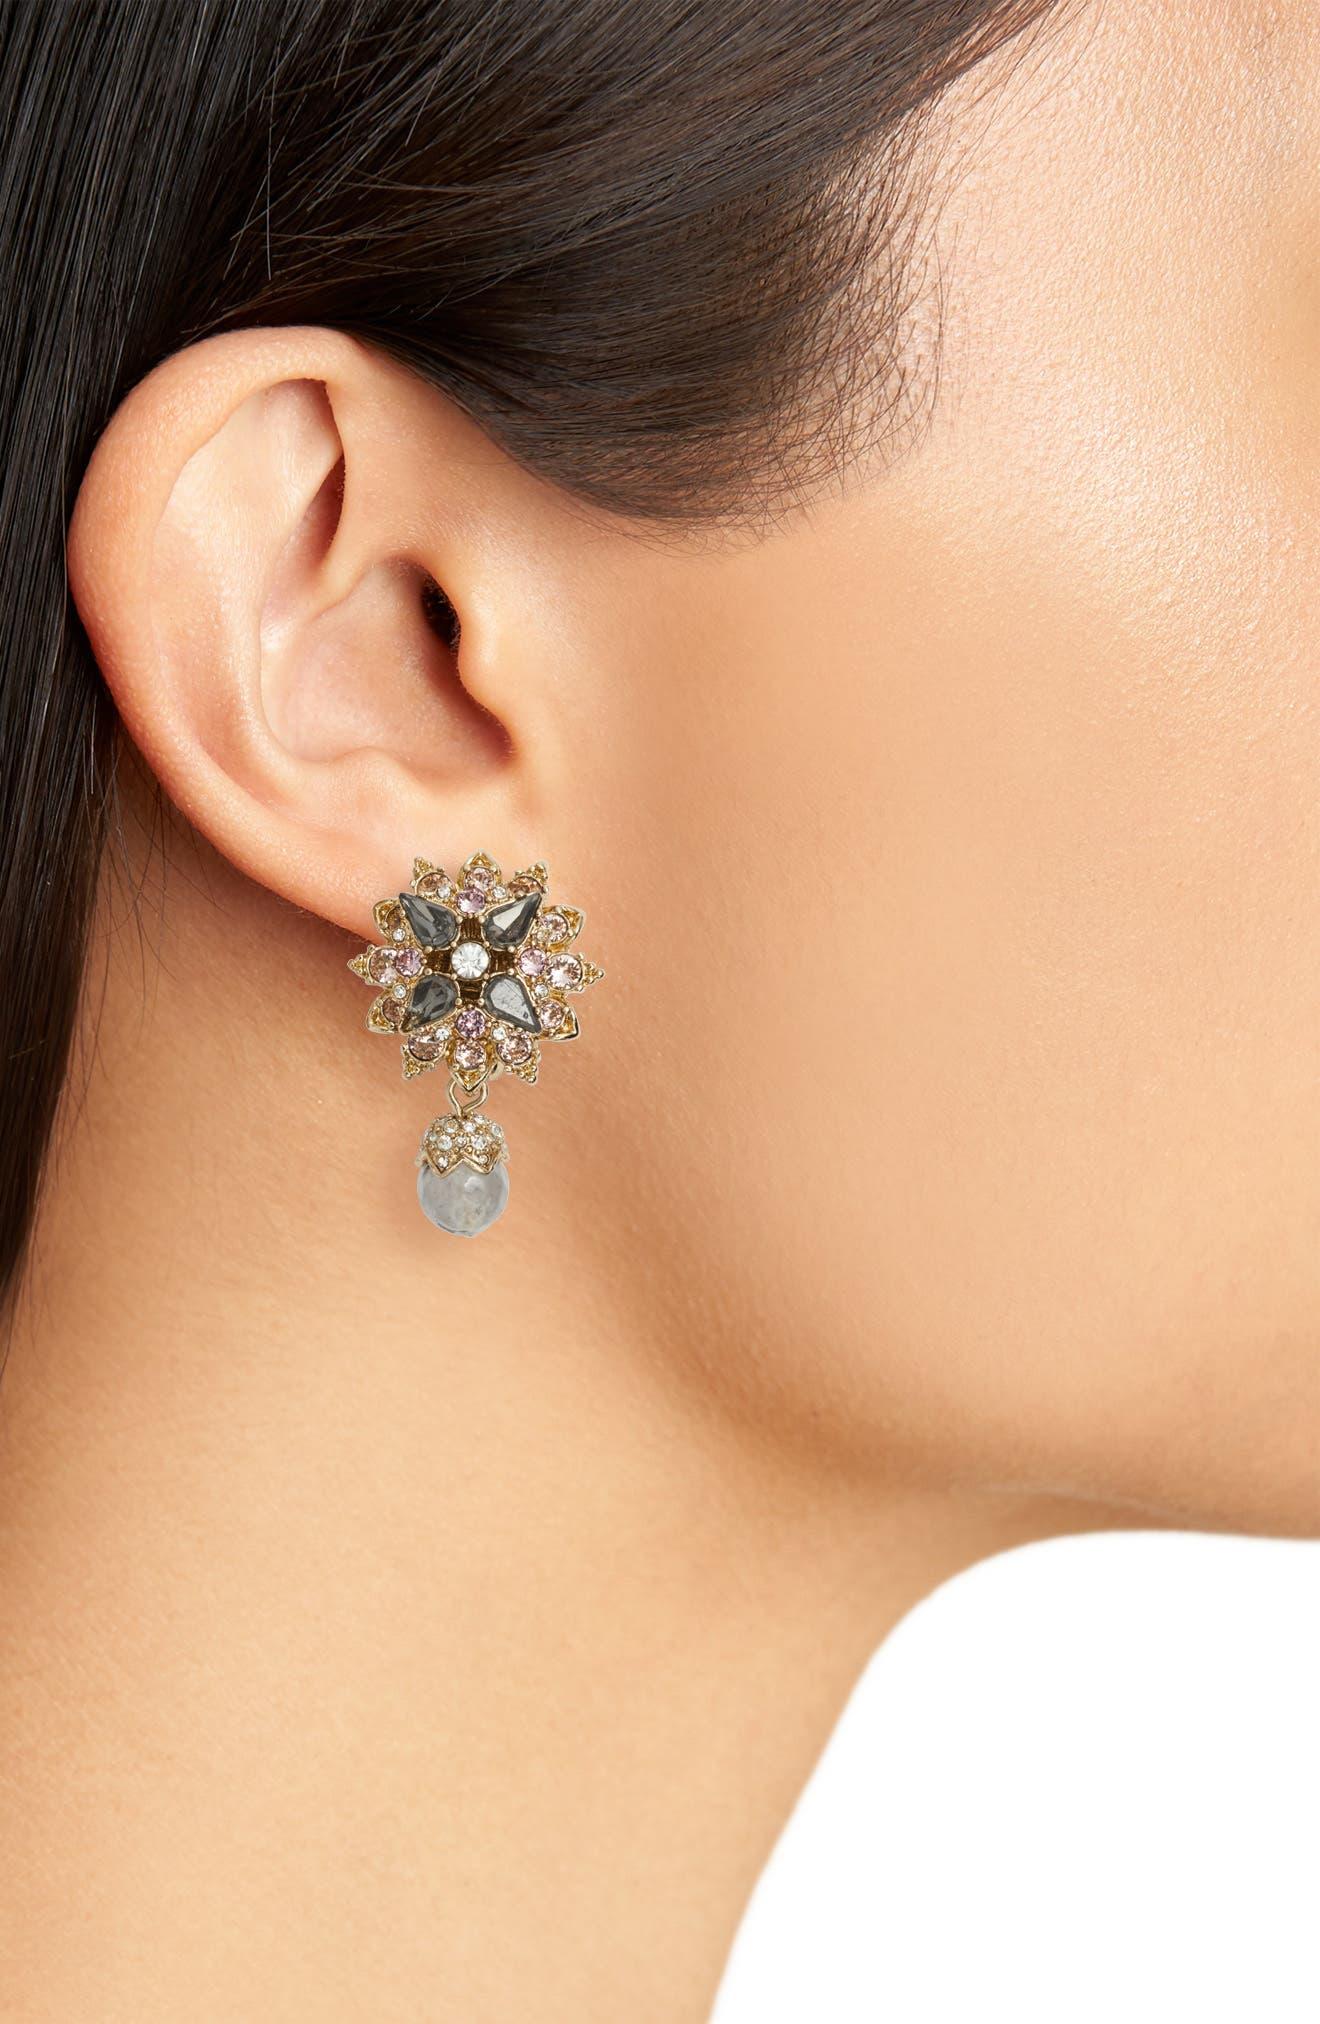 Crystal Drop Earrings,                             Alternate thumbnail 2, color,                             020